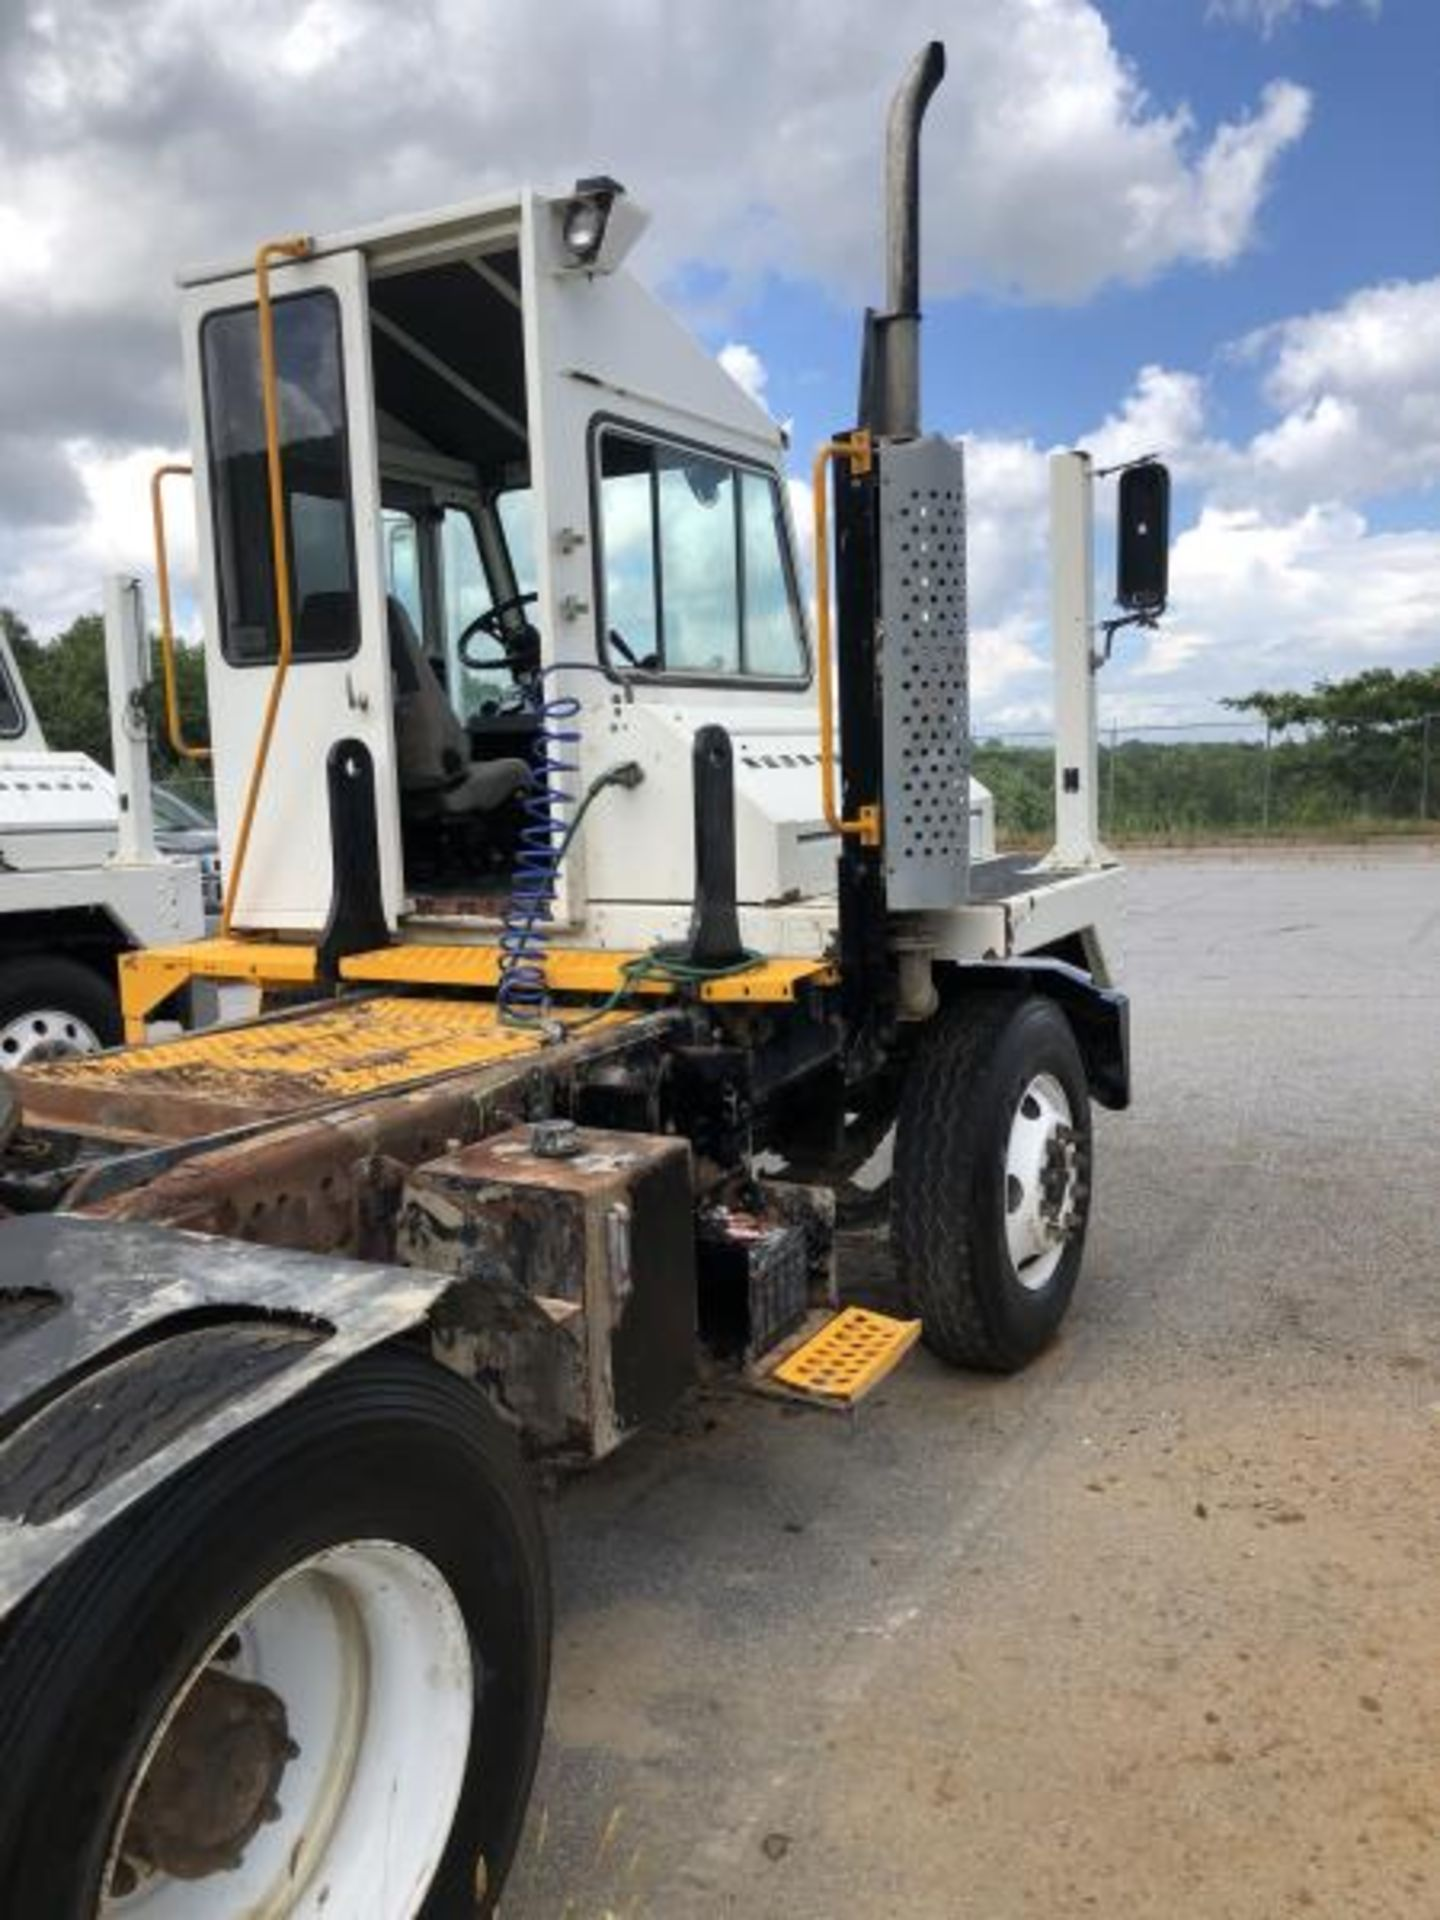 2015 Kalmar Ottawa 4x2 Yard Truck , SN: 338838 3,710.3 Hours, 2,817 Miles - Image 24 of 28